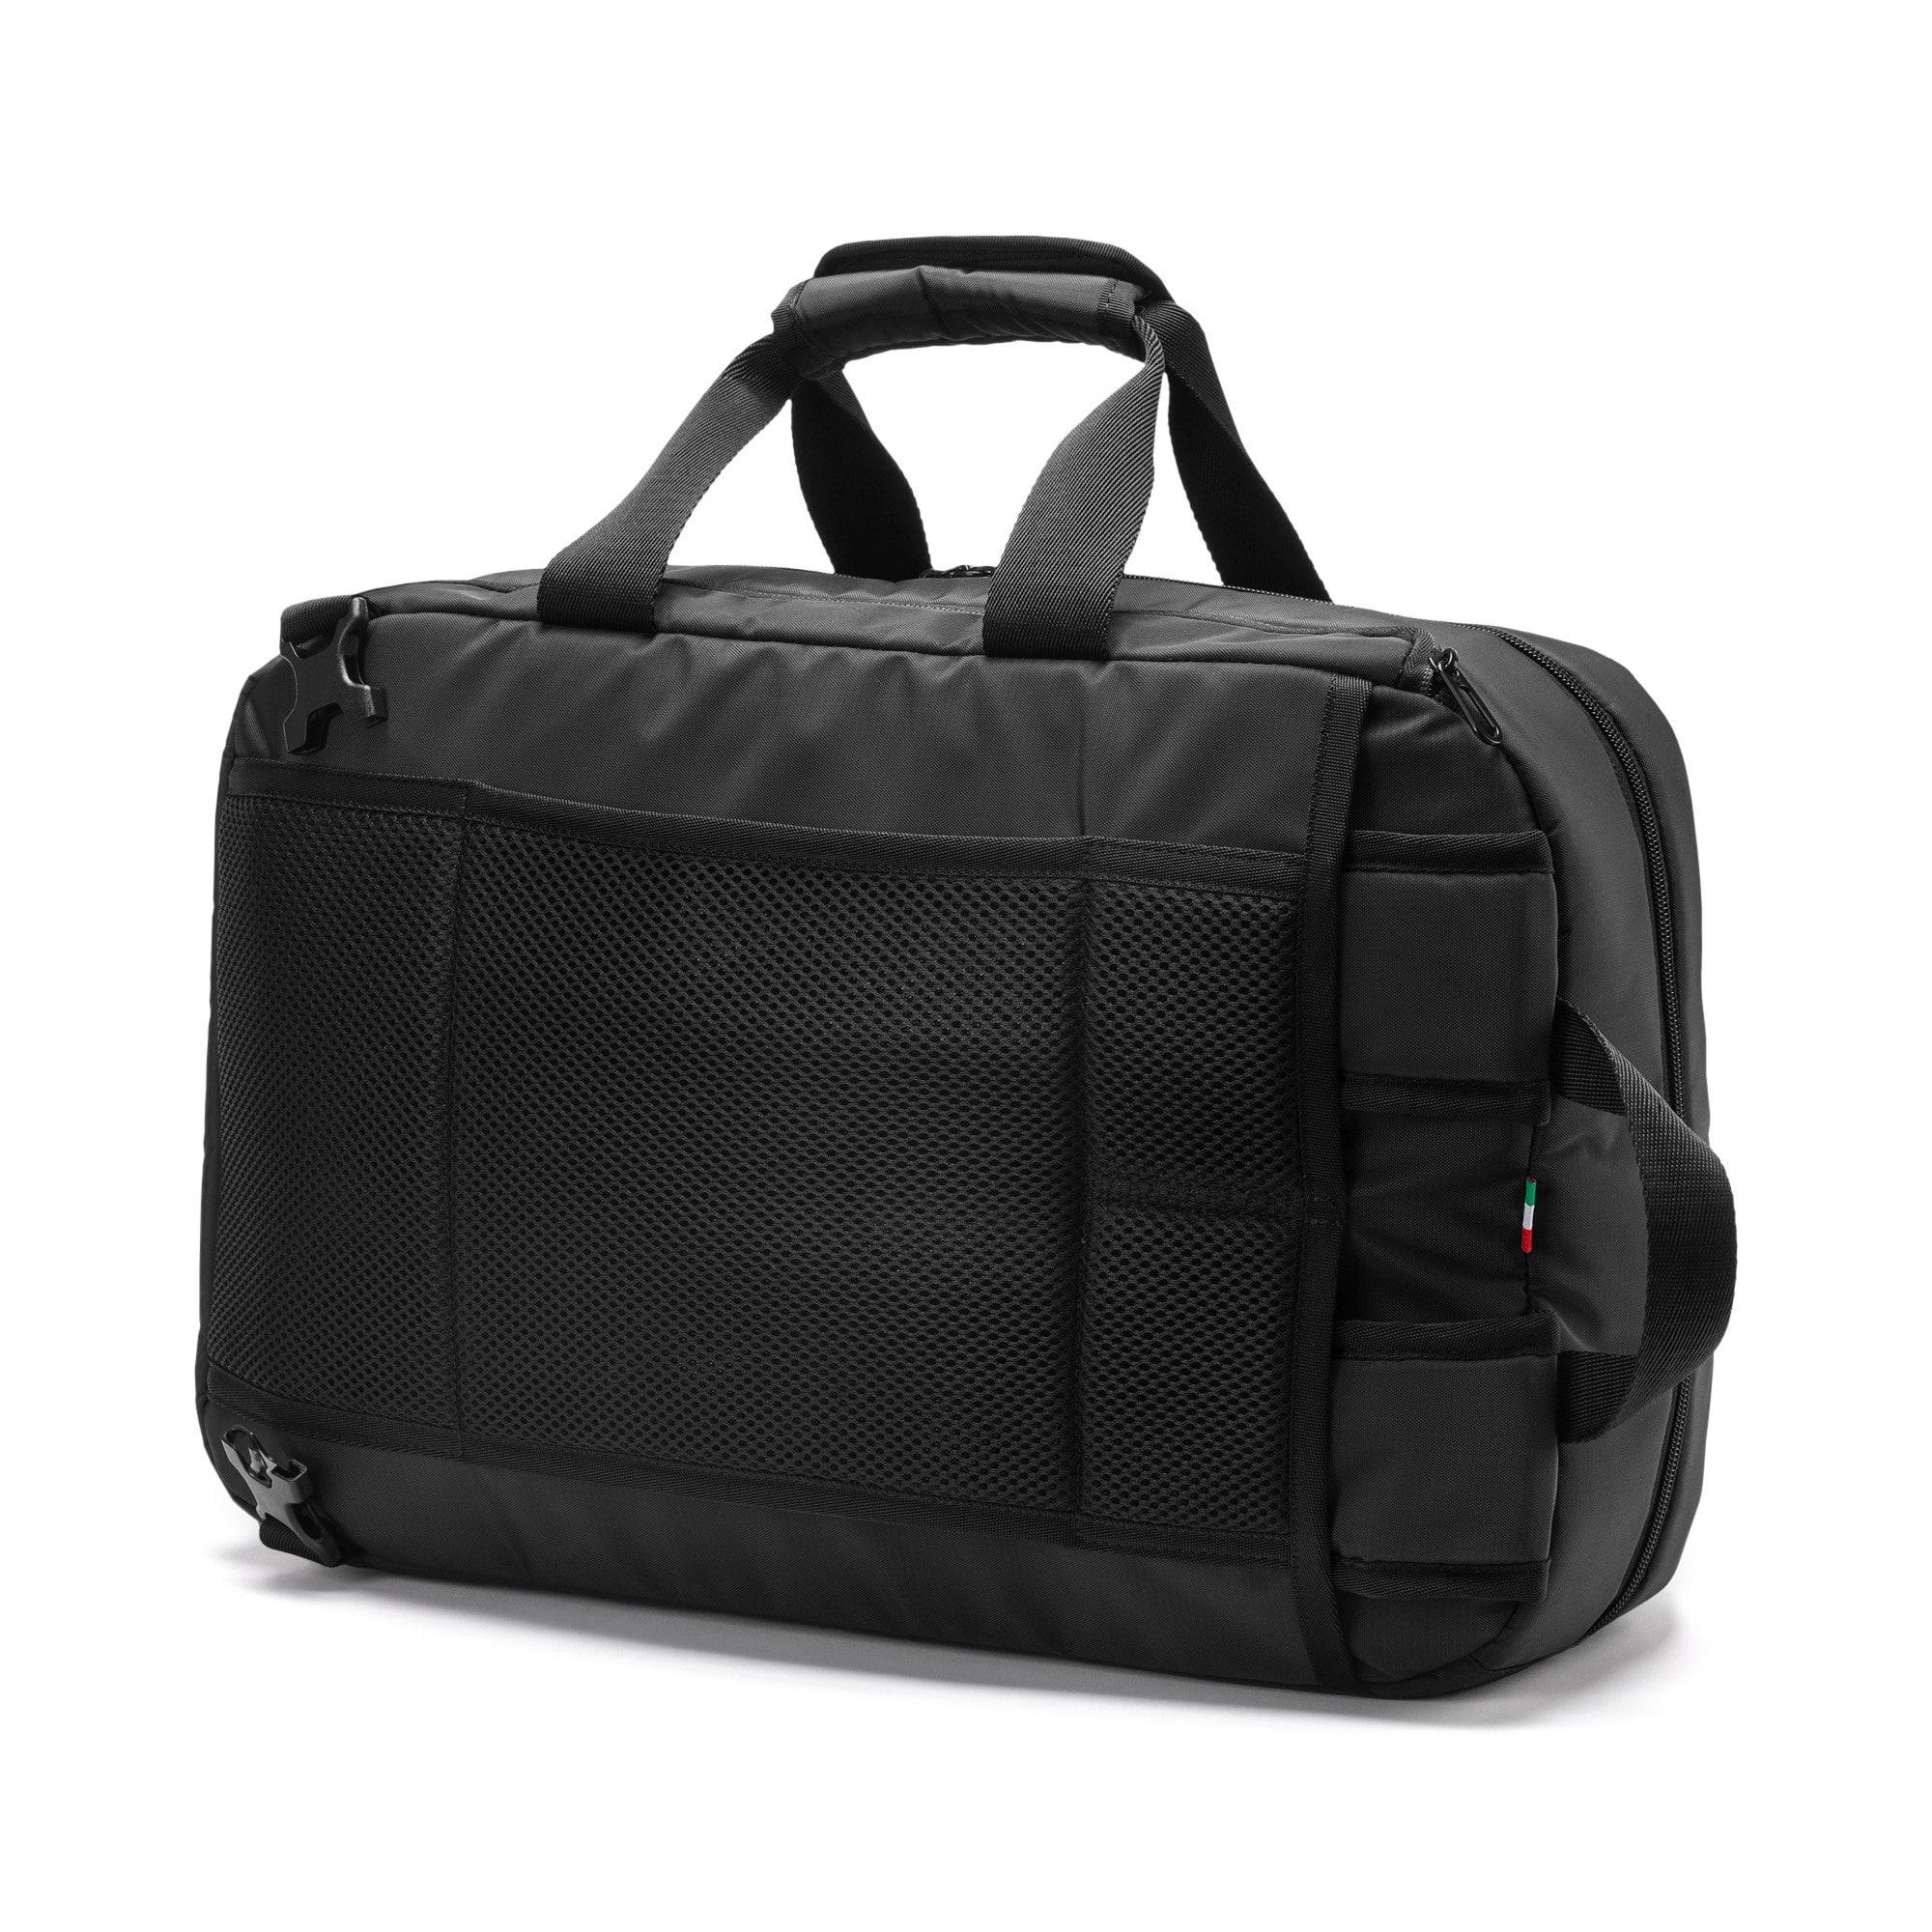 Thumbnail 4 of Ferrari Lifestyle RCT Backpack, Puma Black, medium-IND